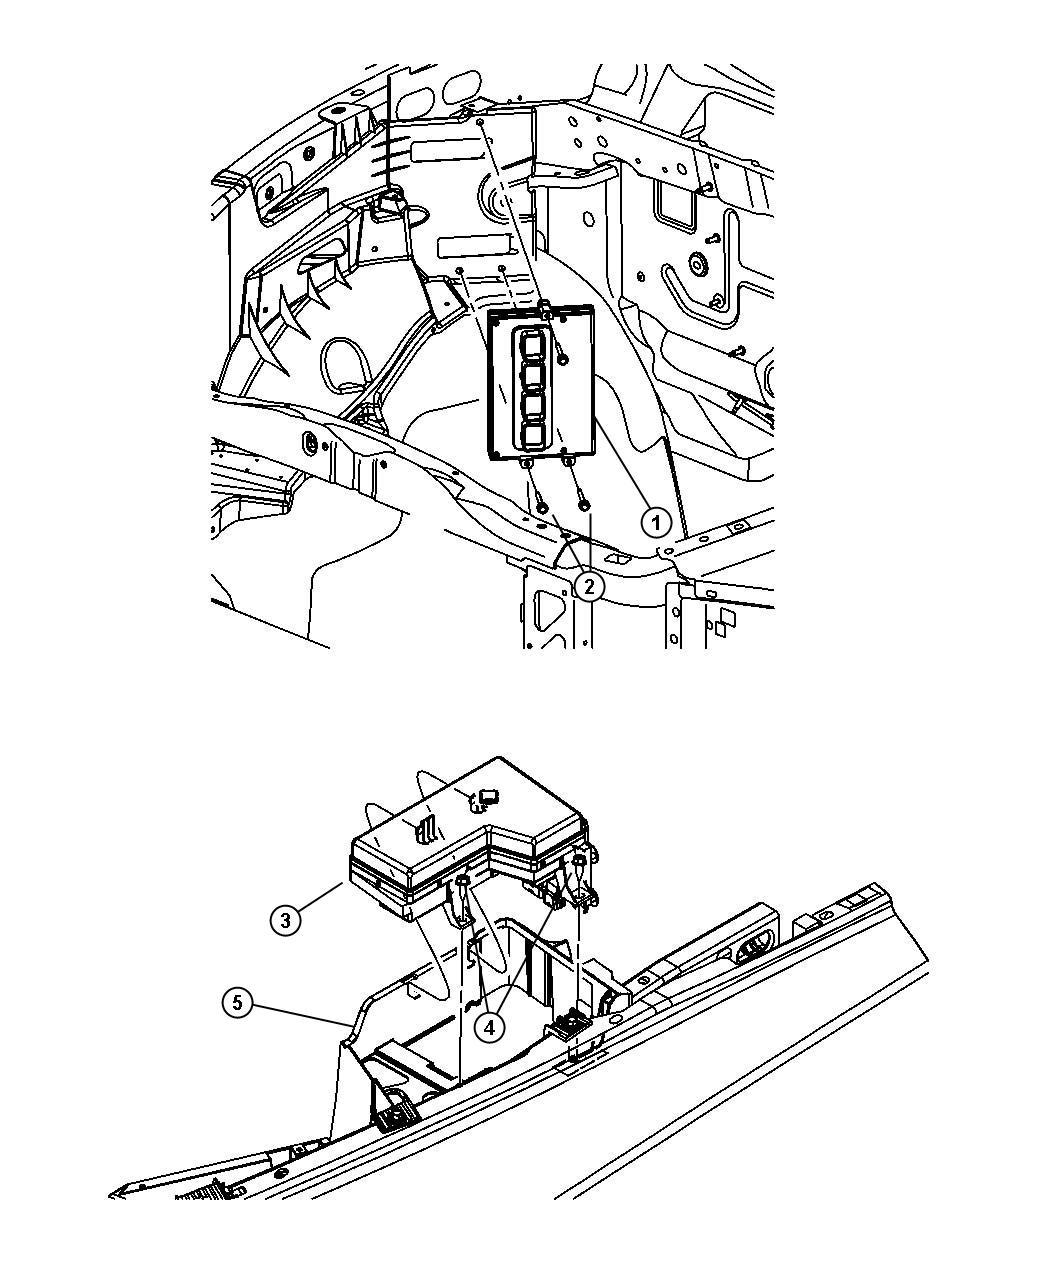 05150498aa jeep module powertrain control generic. Black Bedroom Furniture Sets. Home Design Ideas